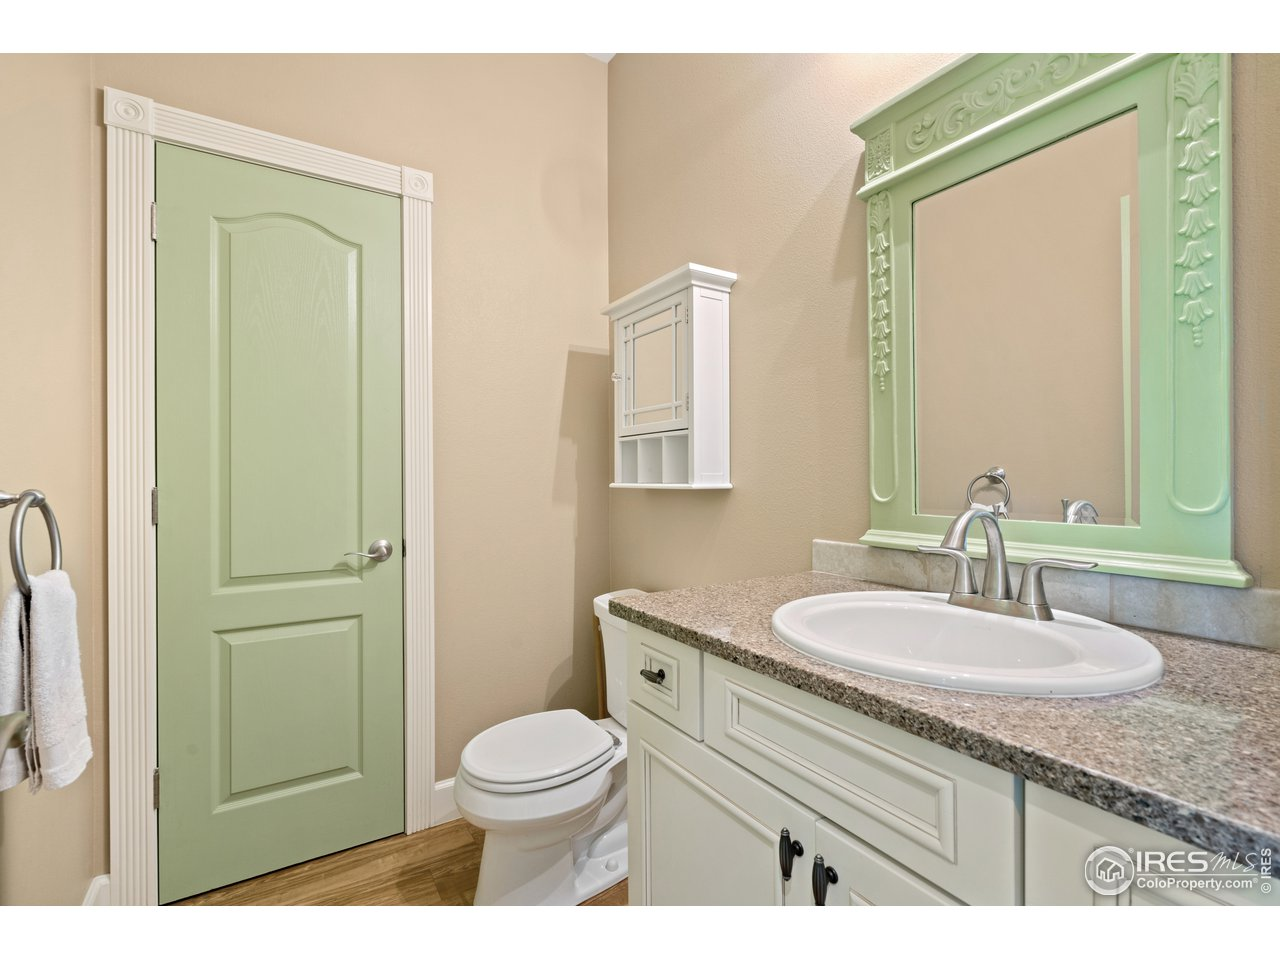 Primary Suite 2 - Bathroom